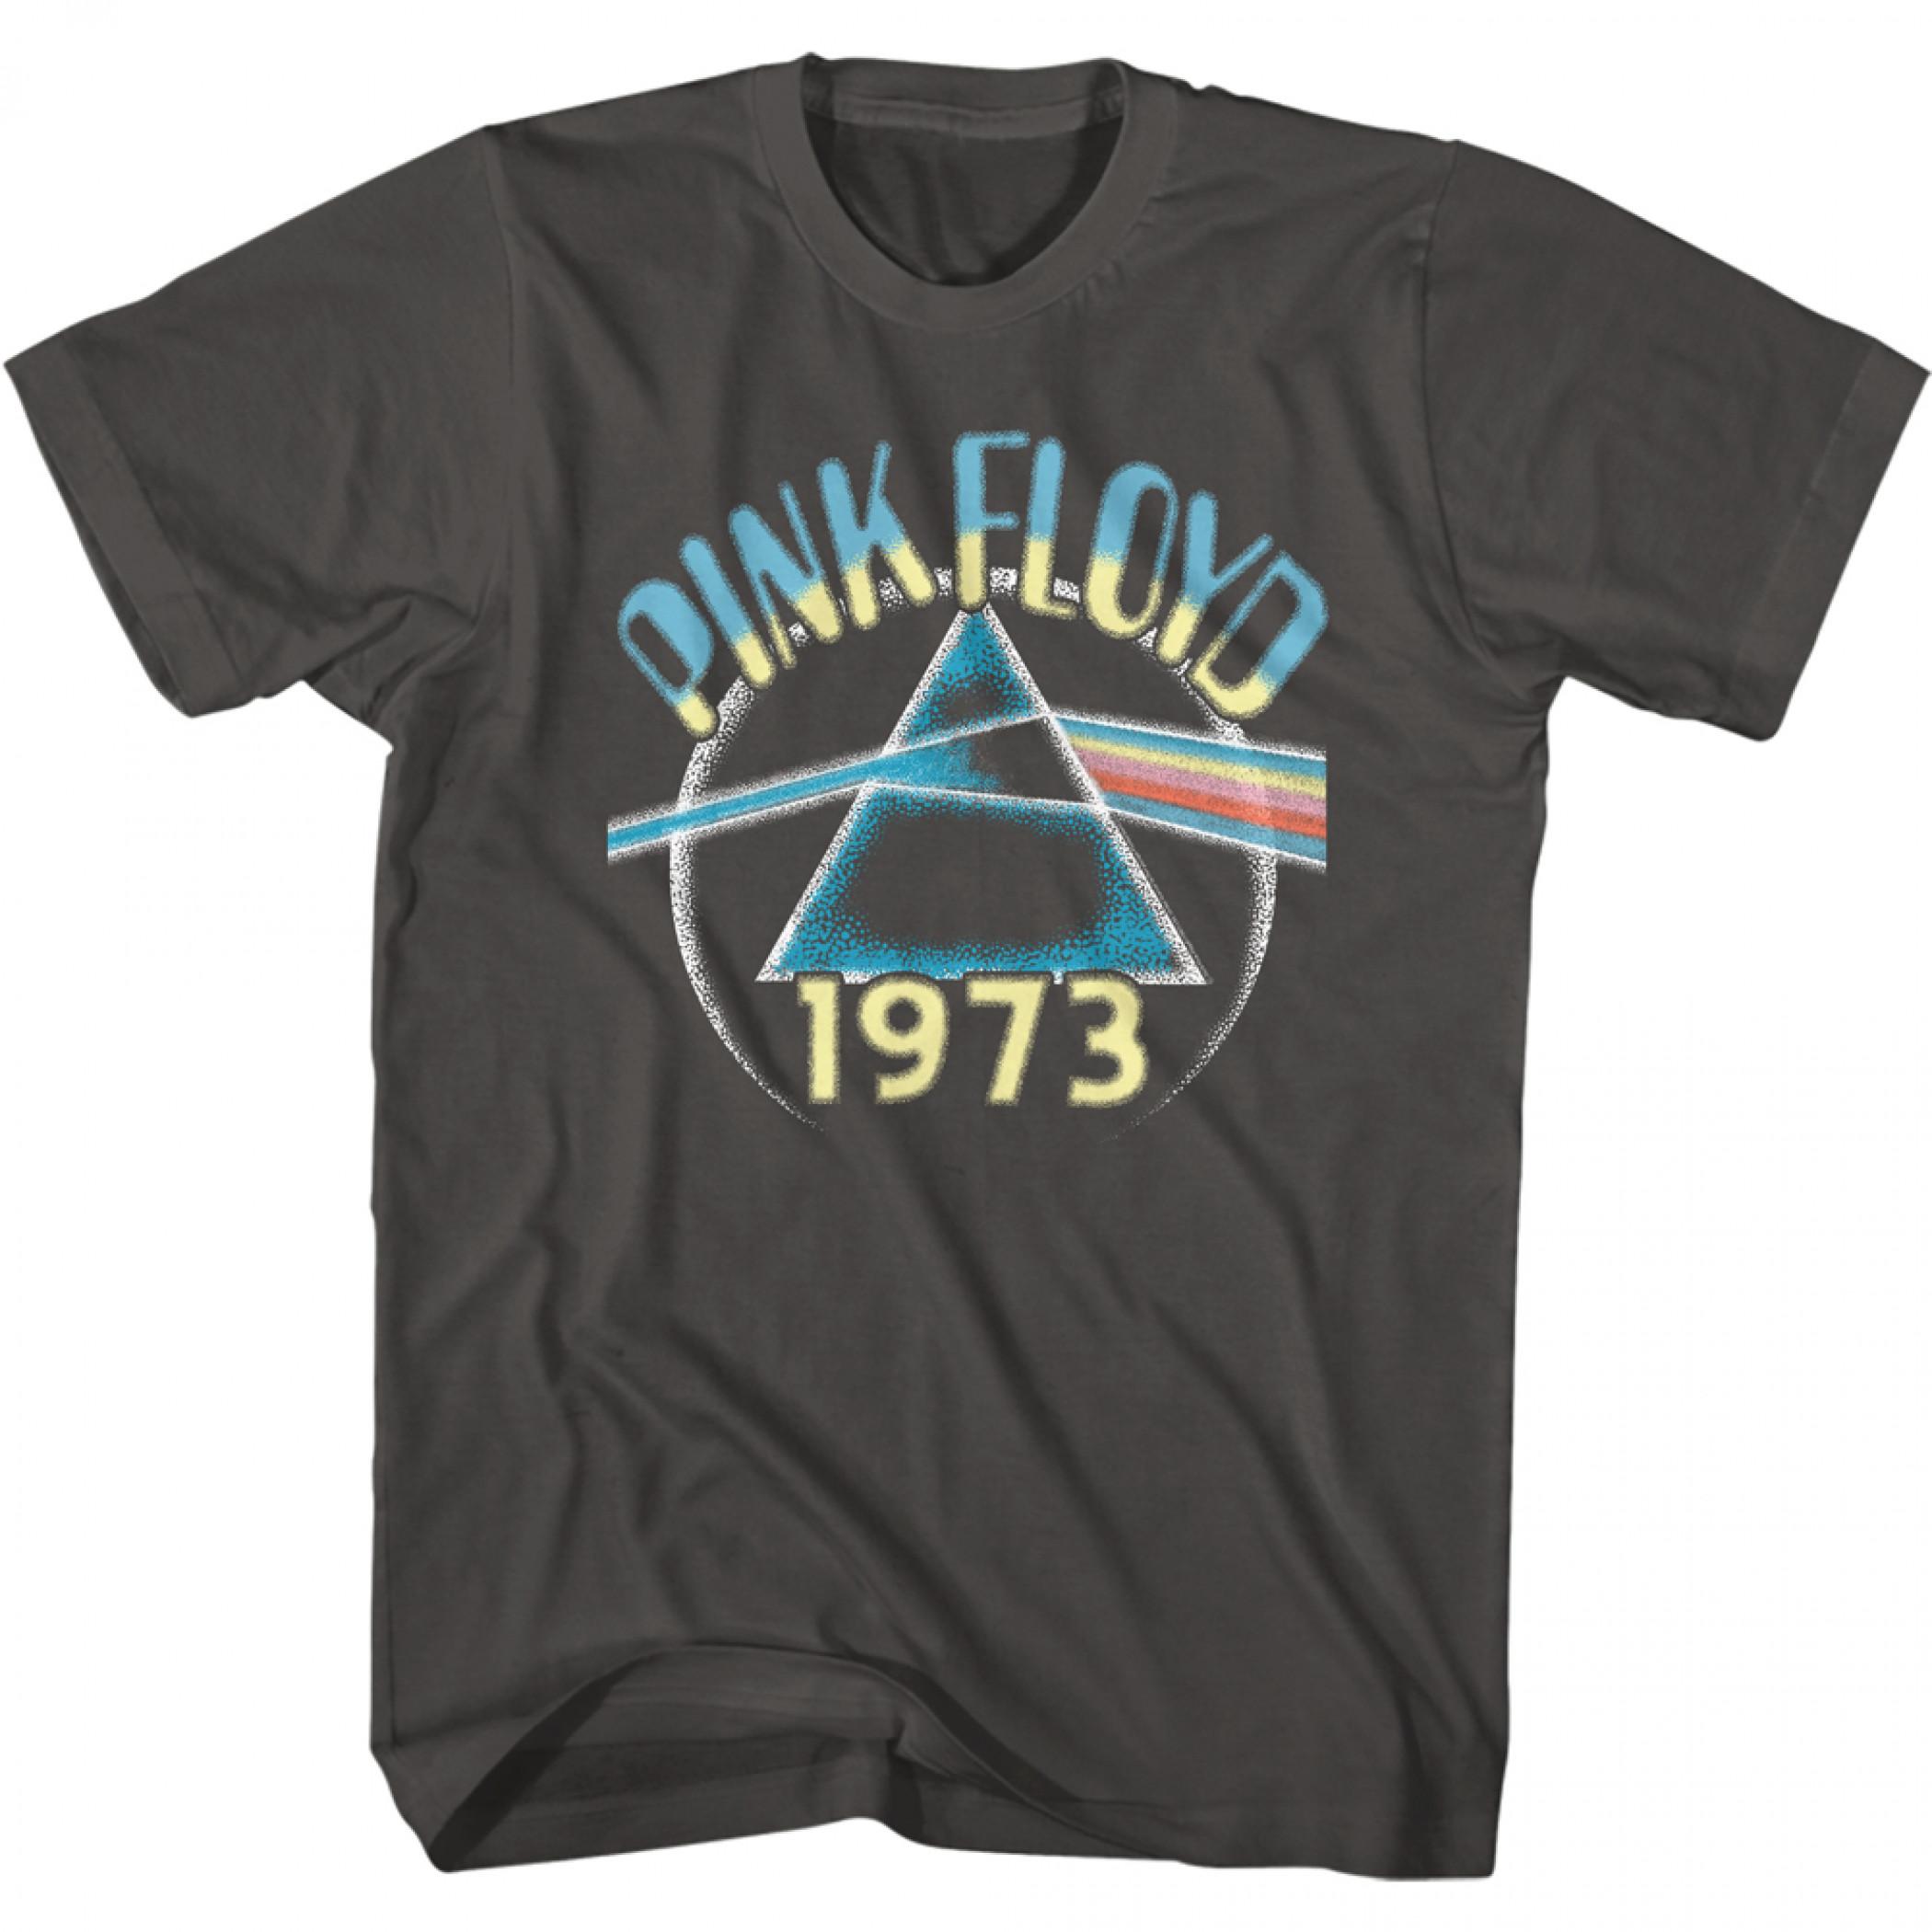 Pink Floyd Tour 1973 T-Shirt